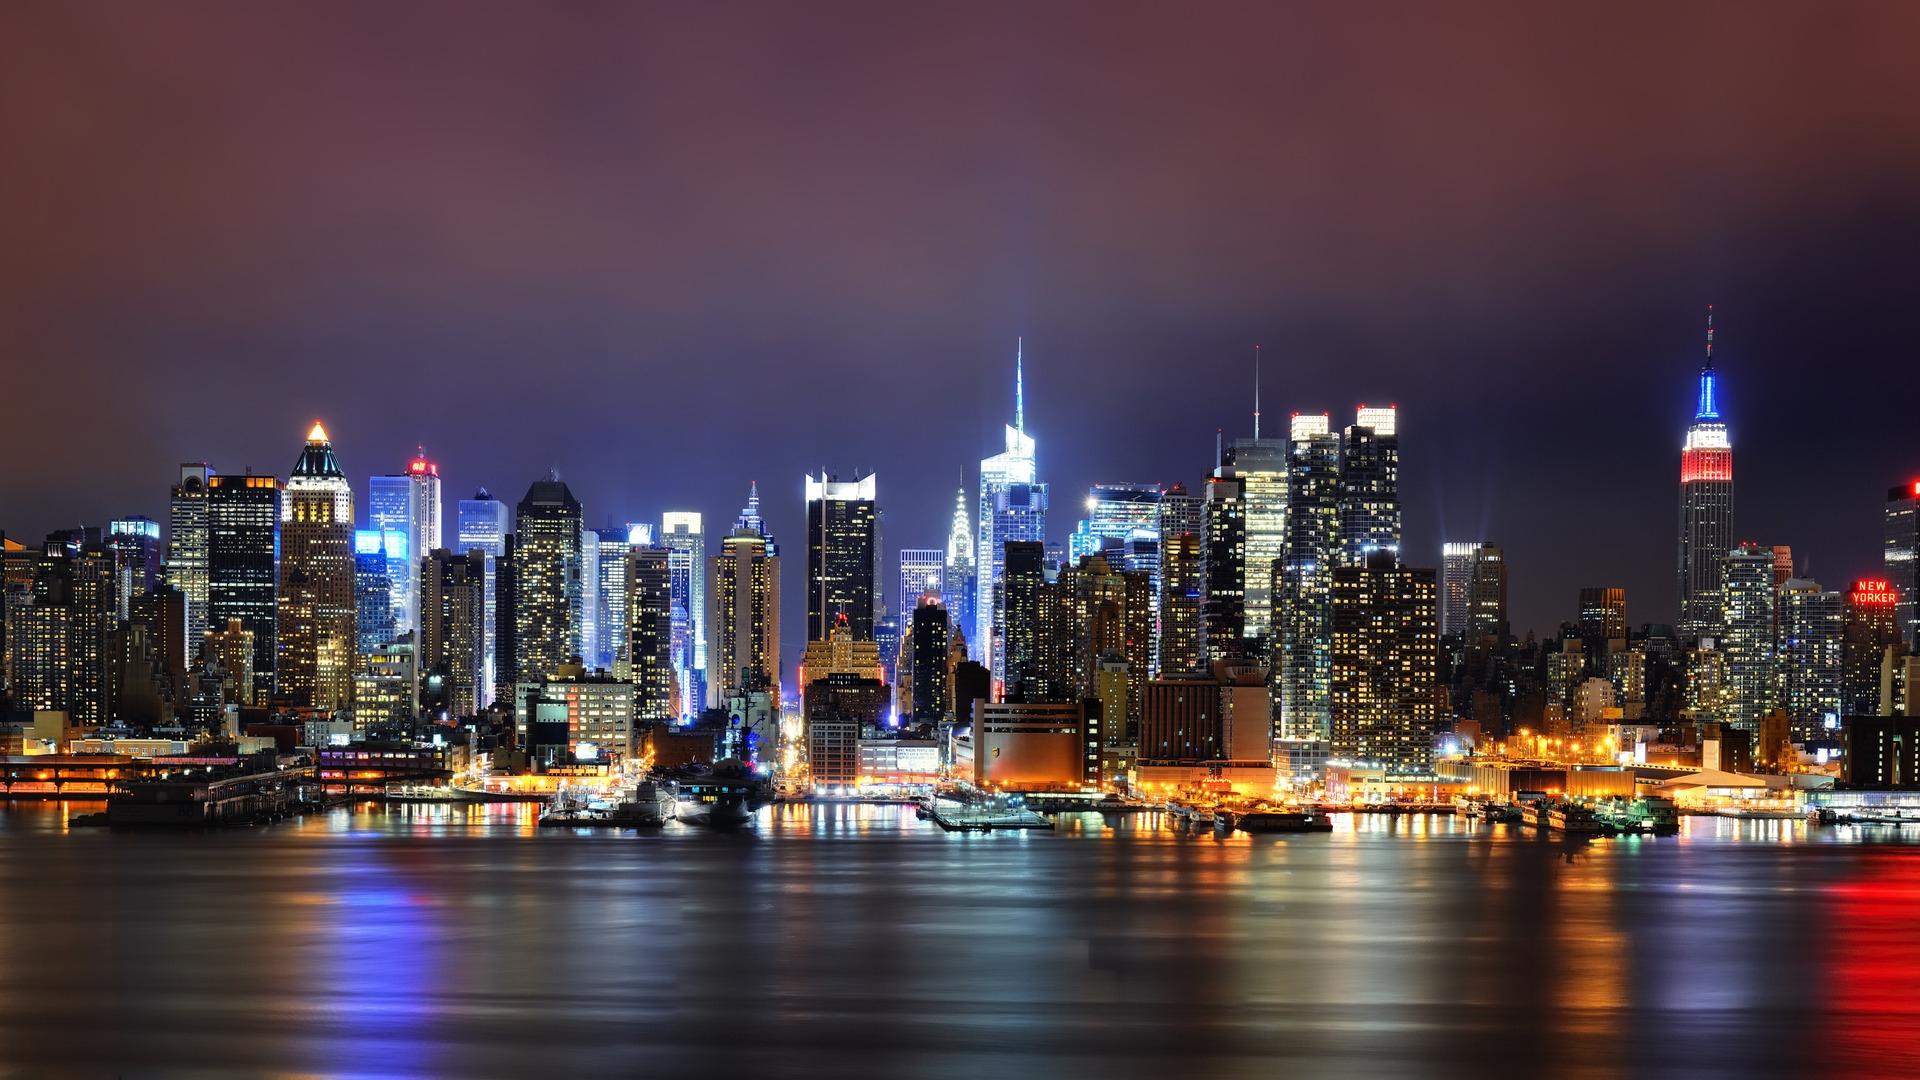 New York City Wallpaper 18010 1920x1080 px HDWallSourcecom 1920x1080